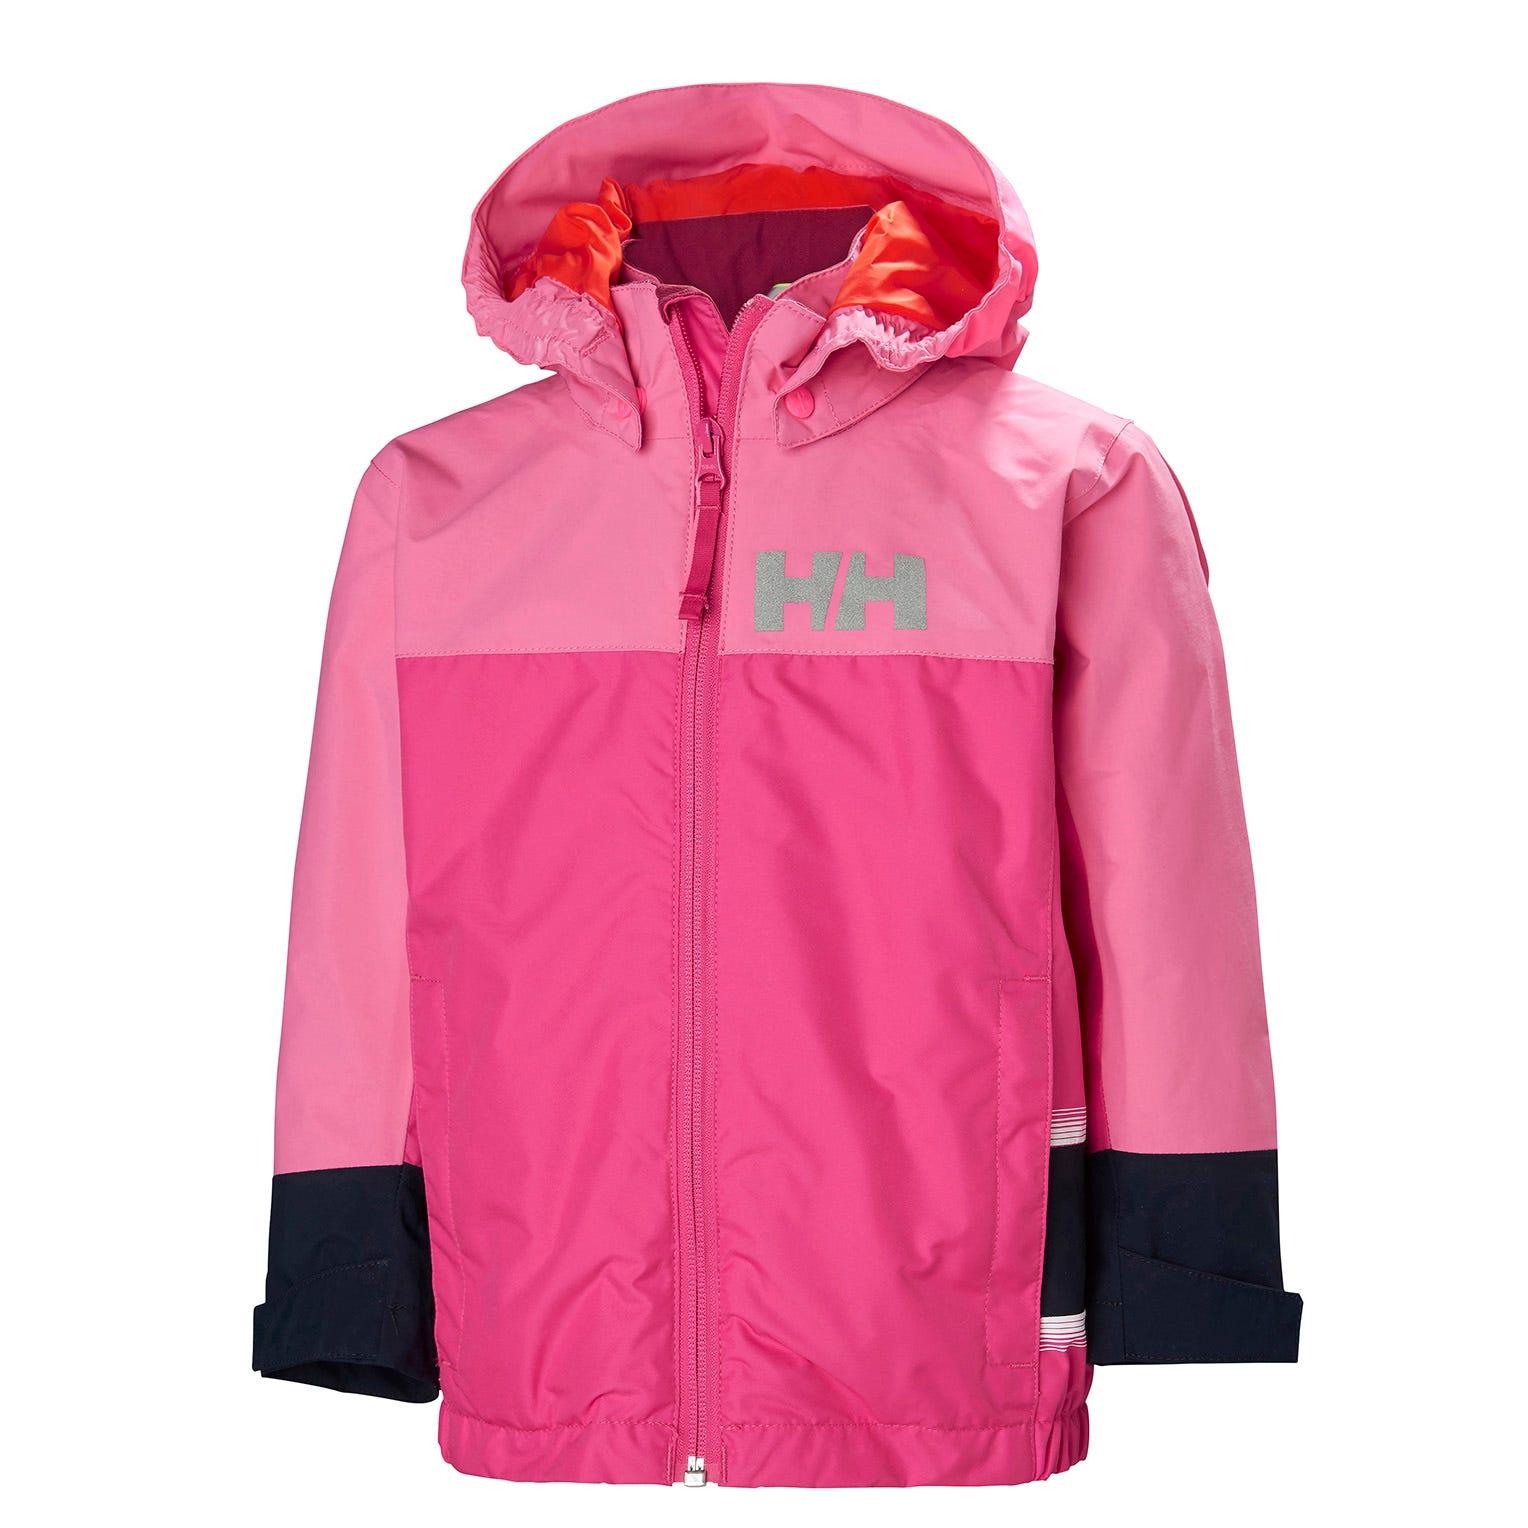 Helly Hansen Kids Norse Jacket Parka Pink 86/1